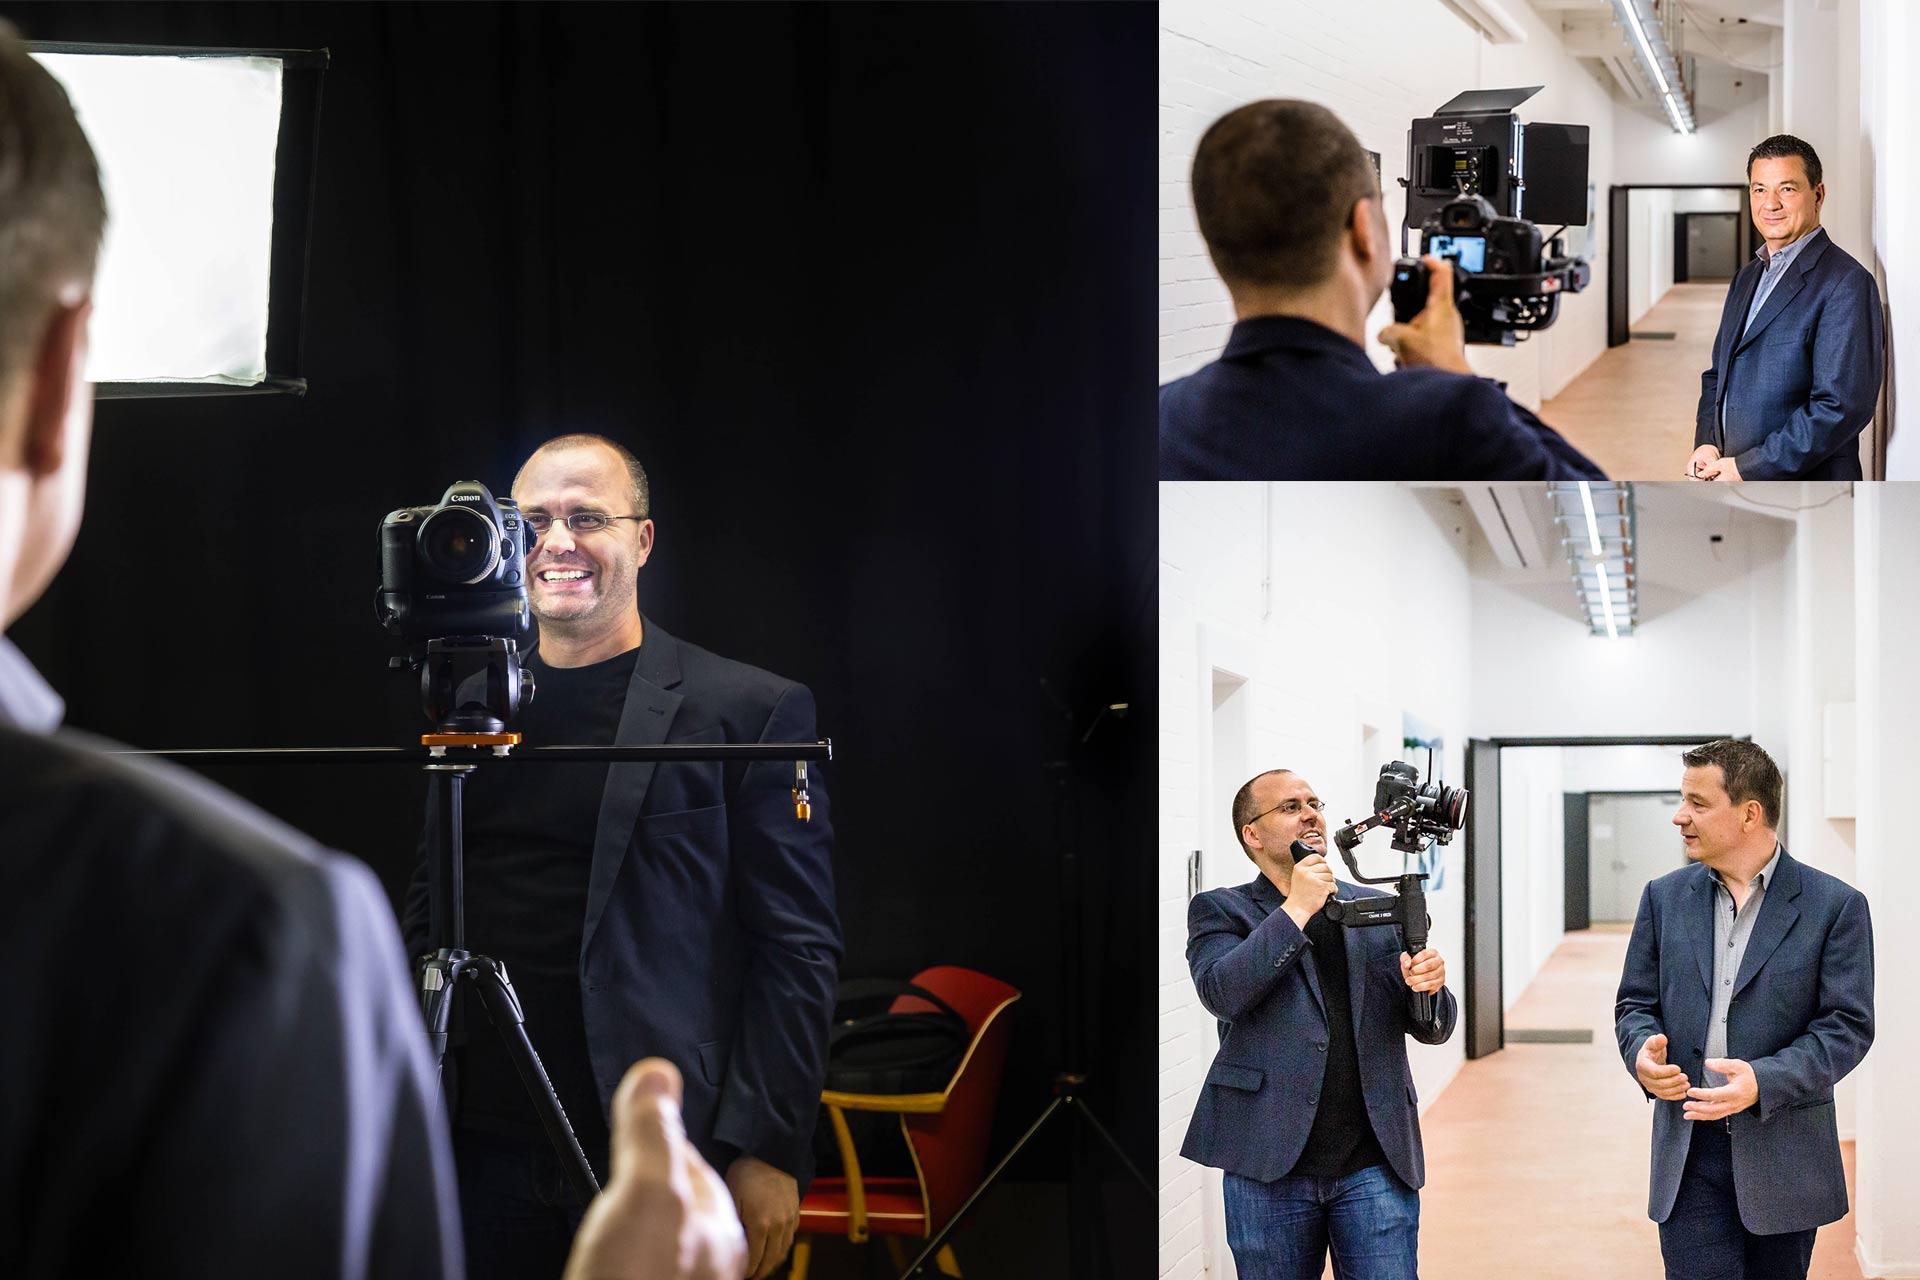 businessfotografie-berlin-imagefilme-der-gottwald